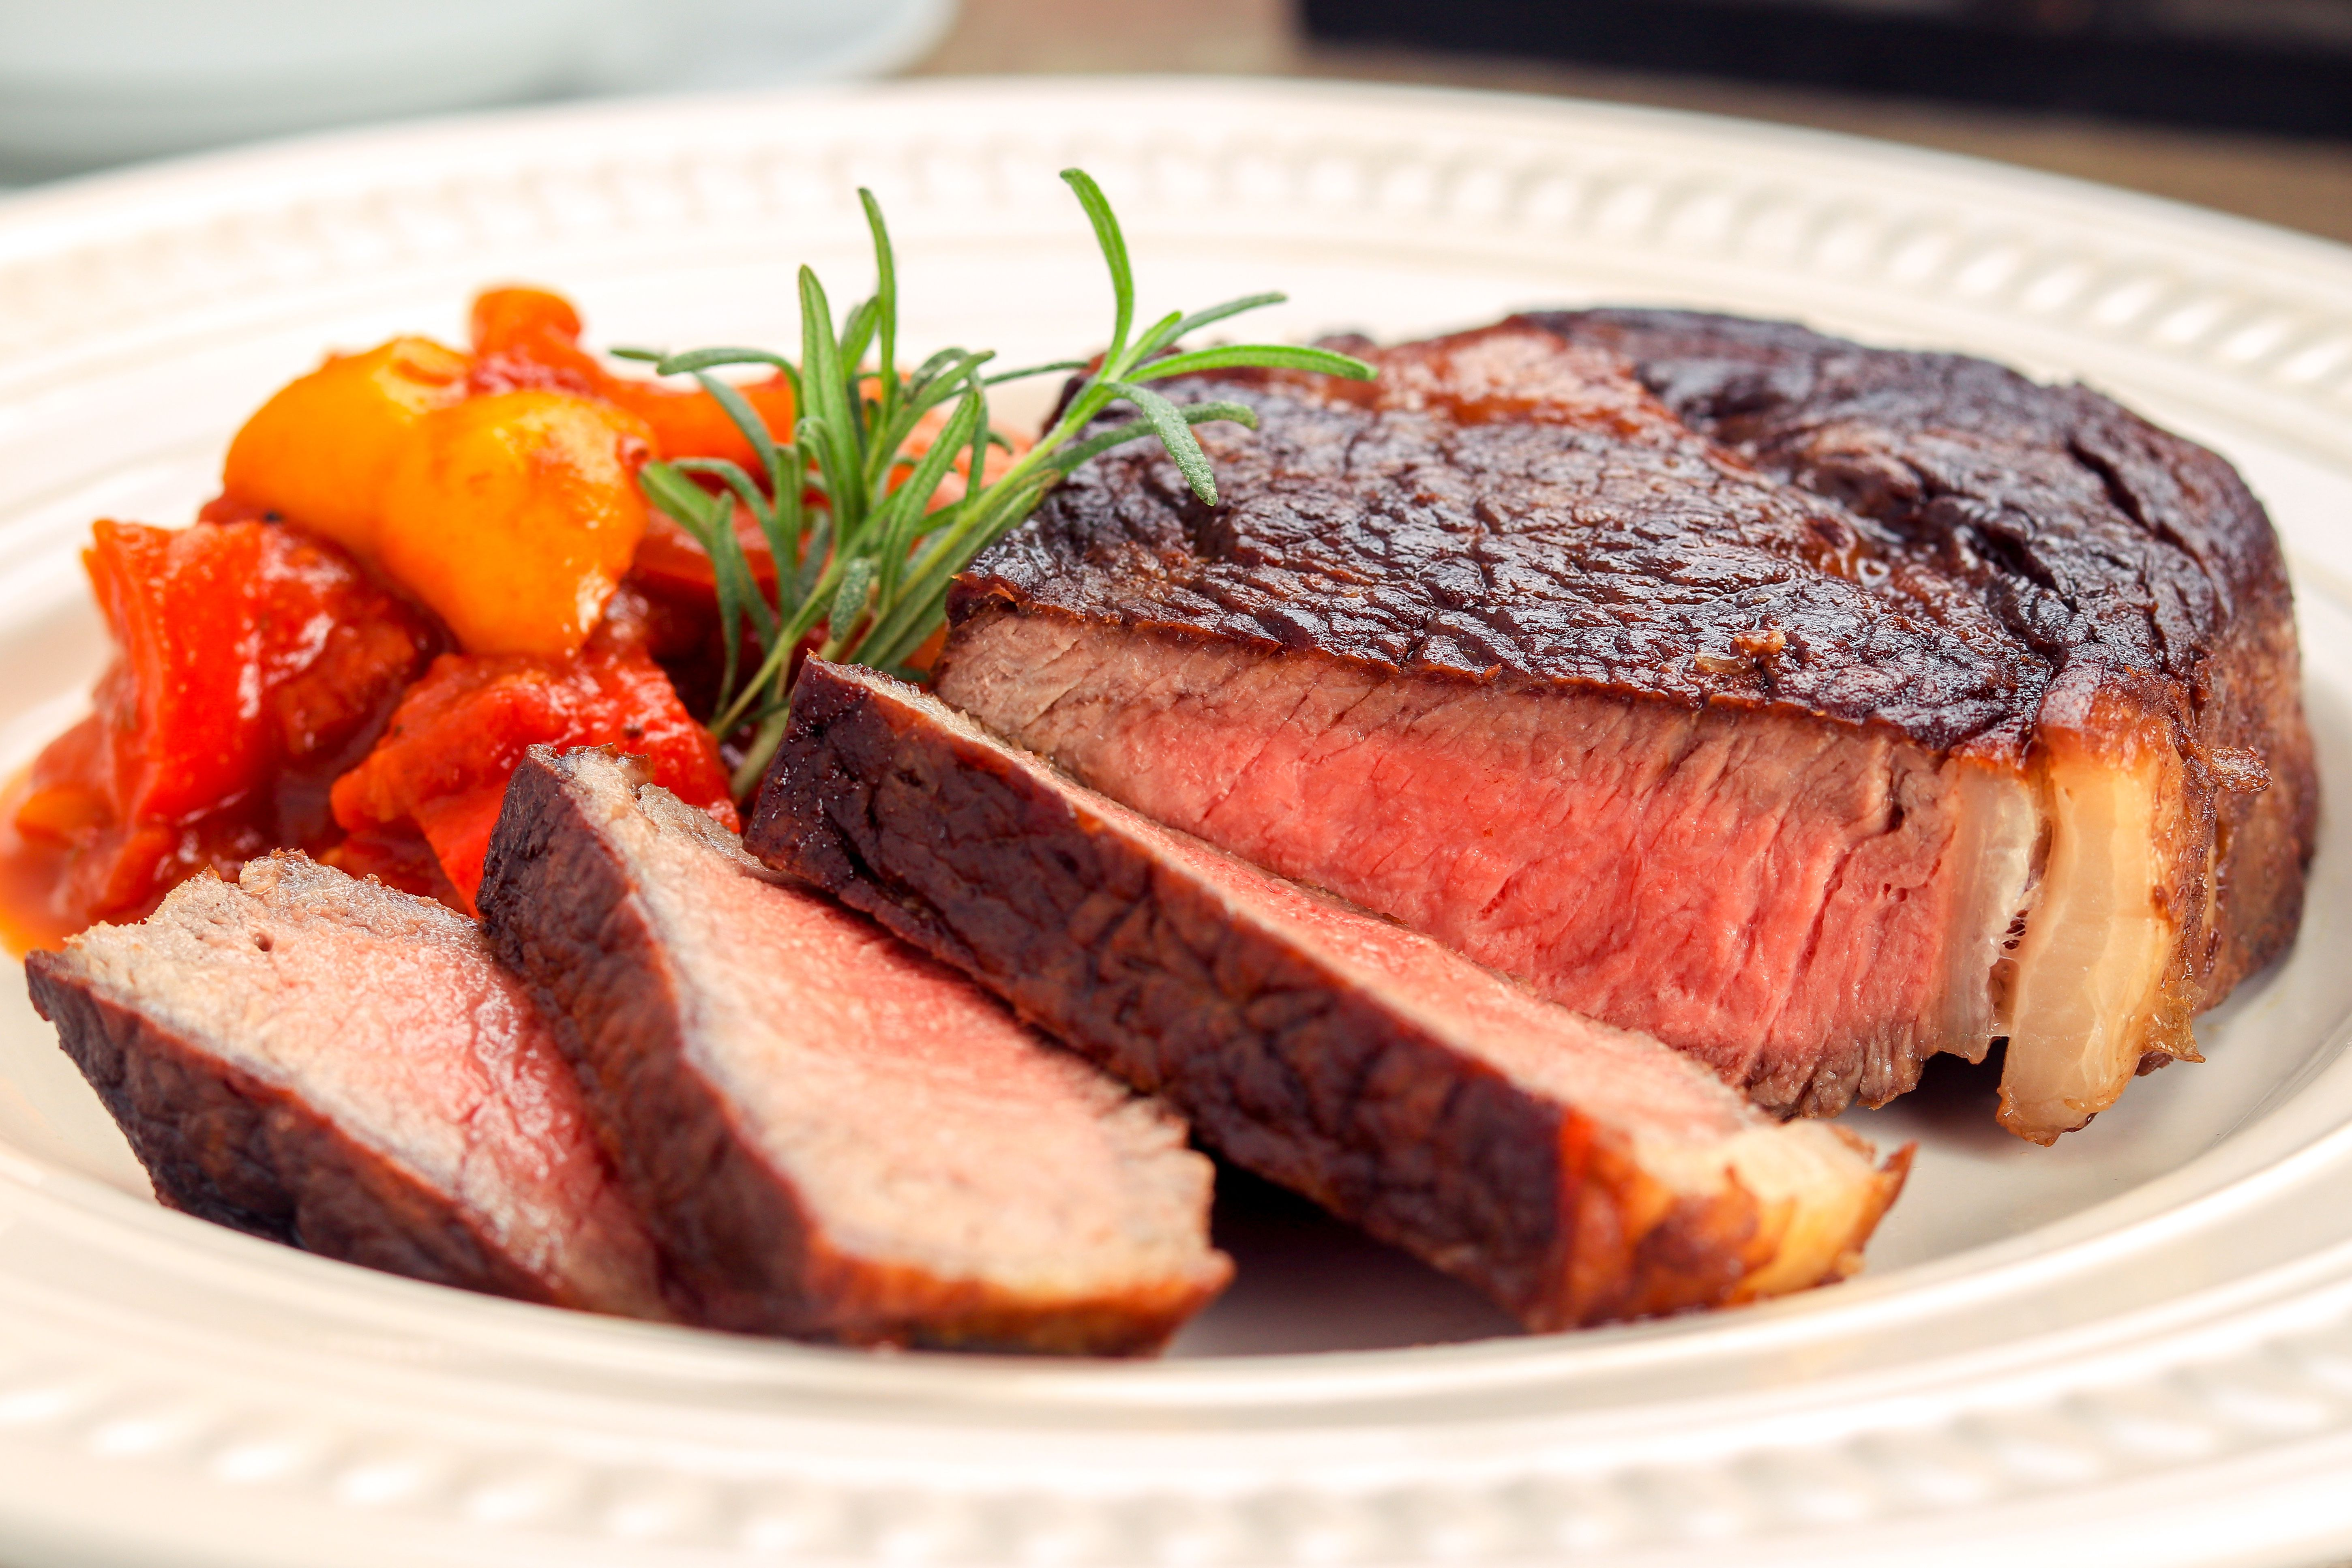 Butter-basted ribeye steak.